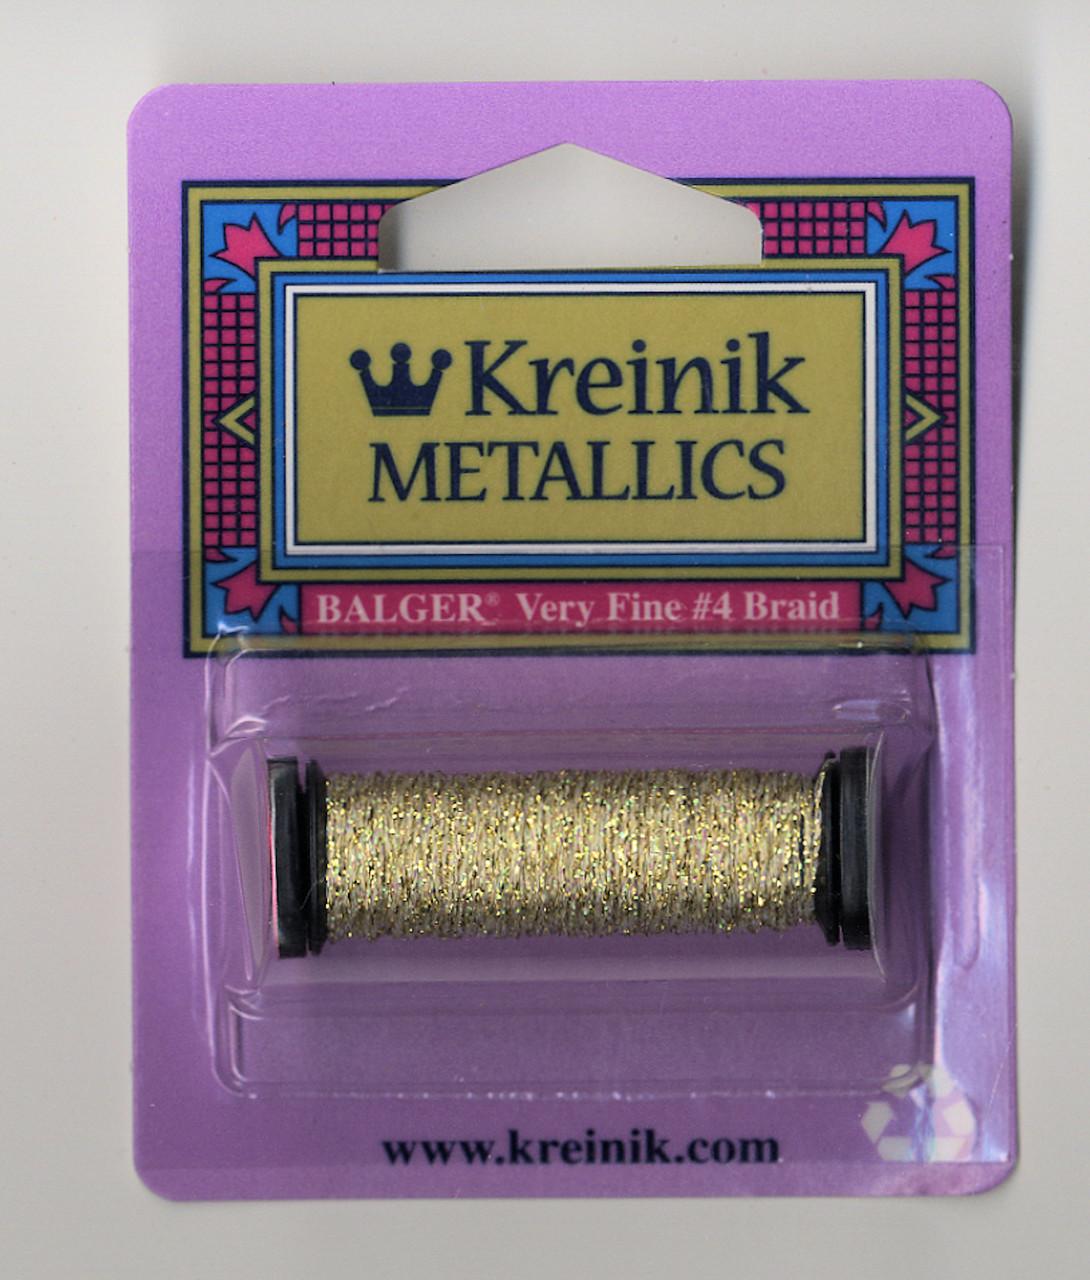 Kreinik Metallics - Very Fine #4 Brazilianite #3232